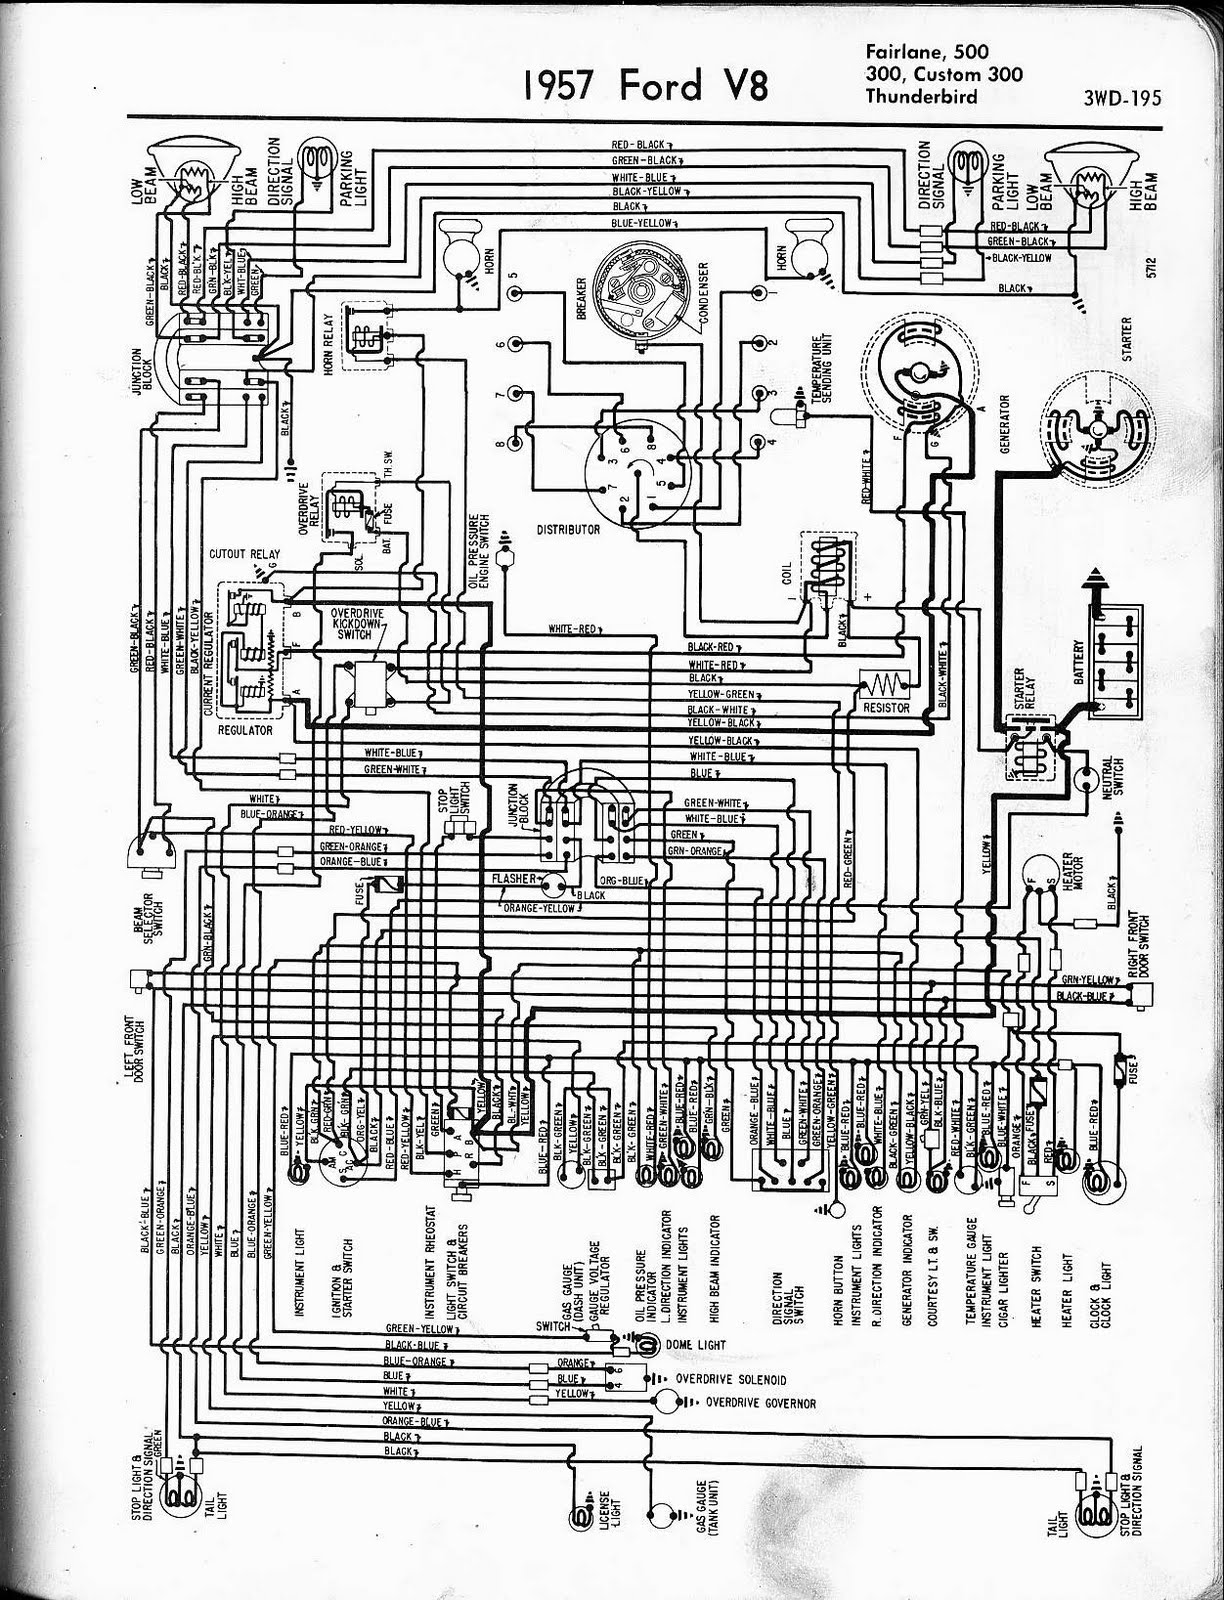 57 thunderbird ignition switch wiring diagram wiring diagrami2 wp com  riseofthethunderbird files wordpress com57 thunderbird ignition